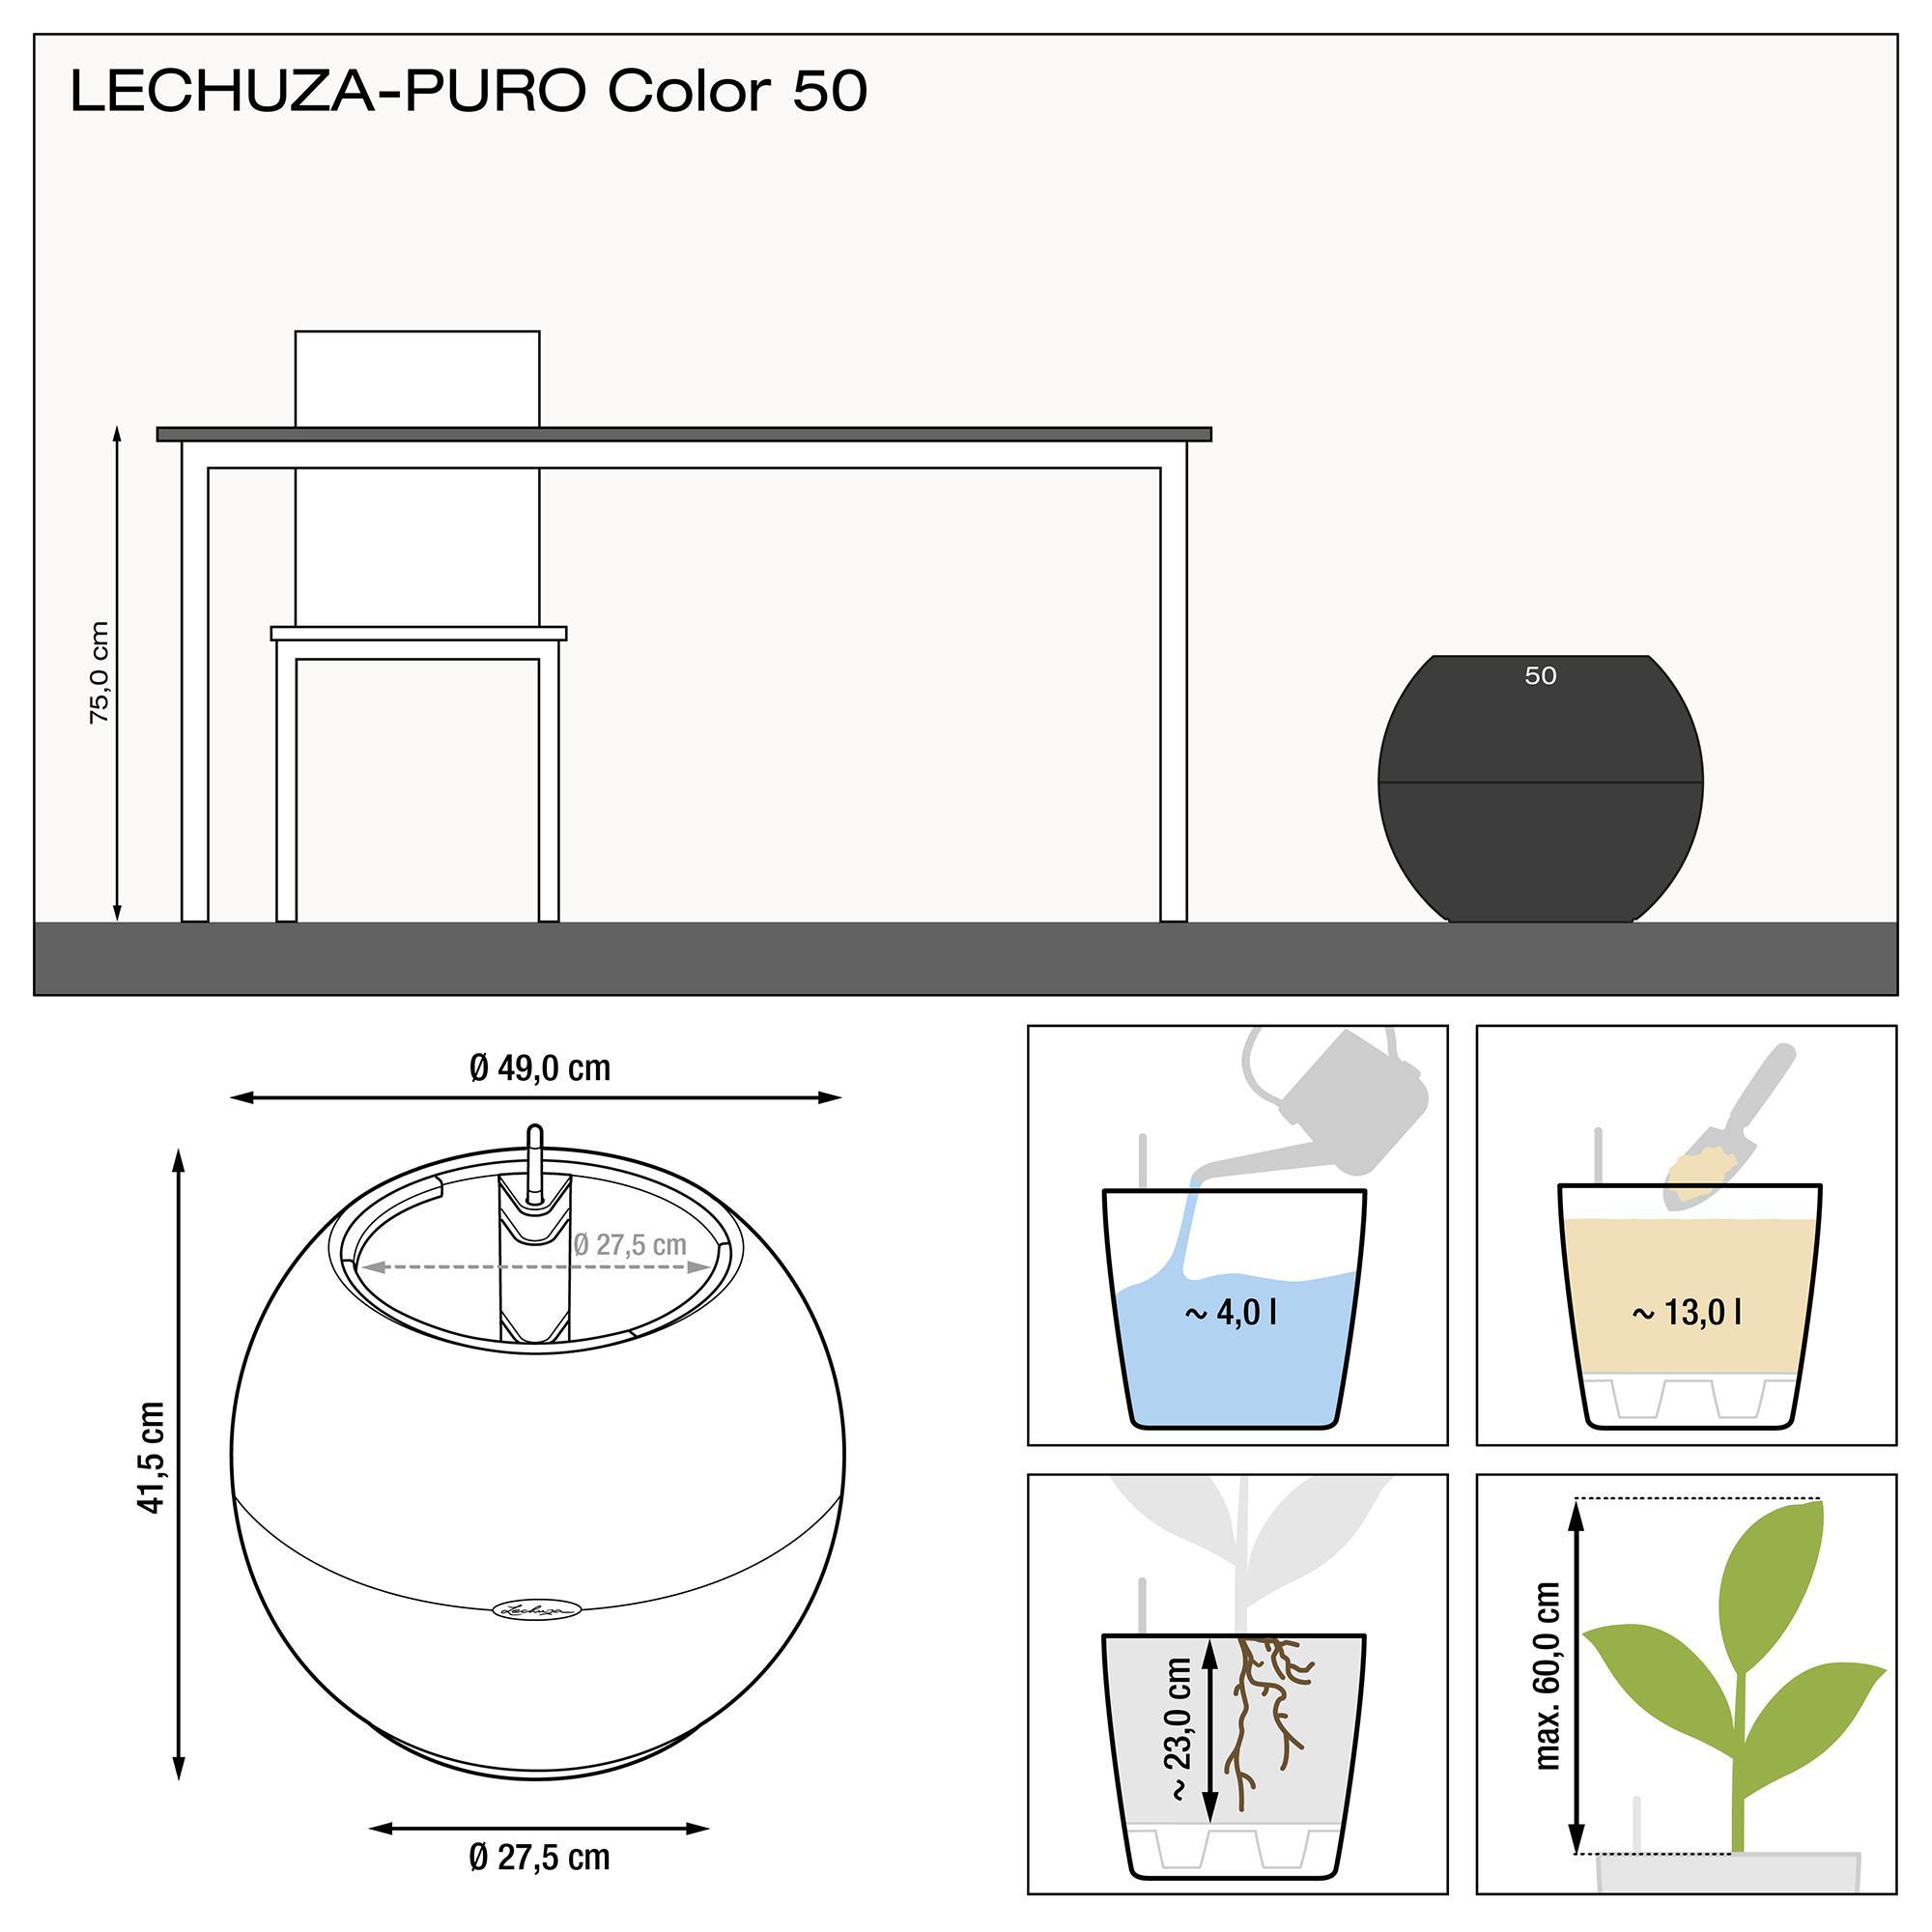 LECHUZA-PURO Color 50 slate - Image 3